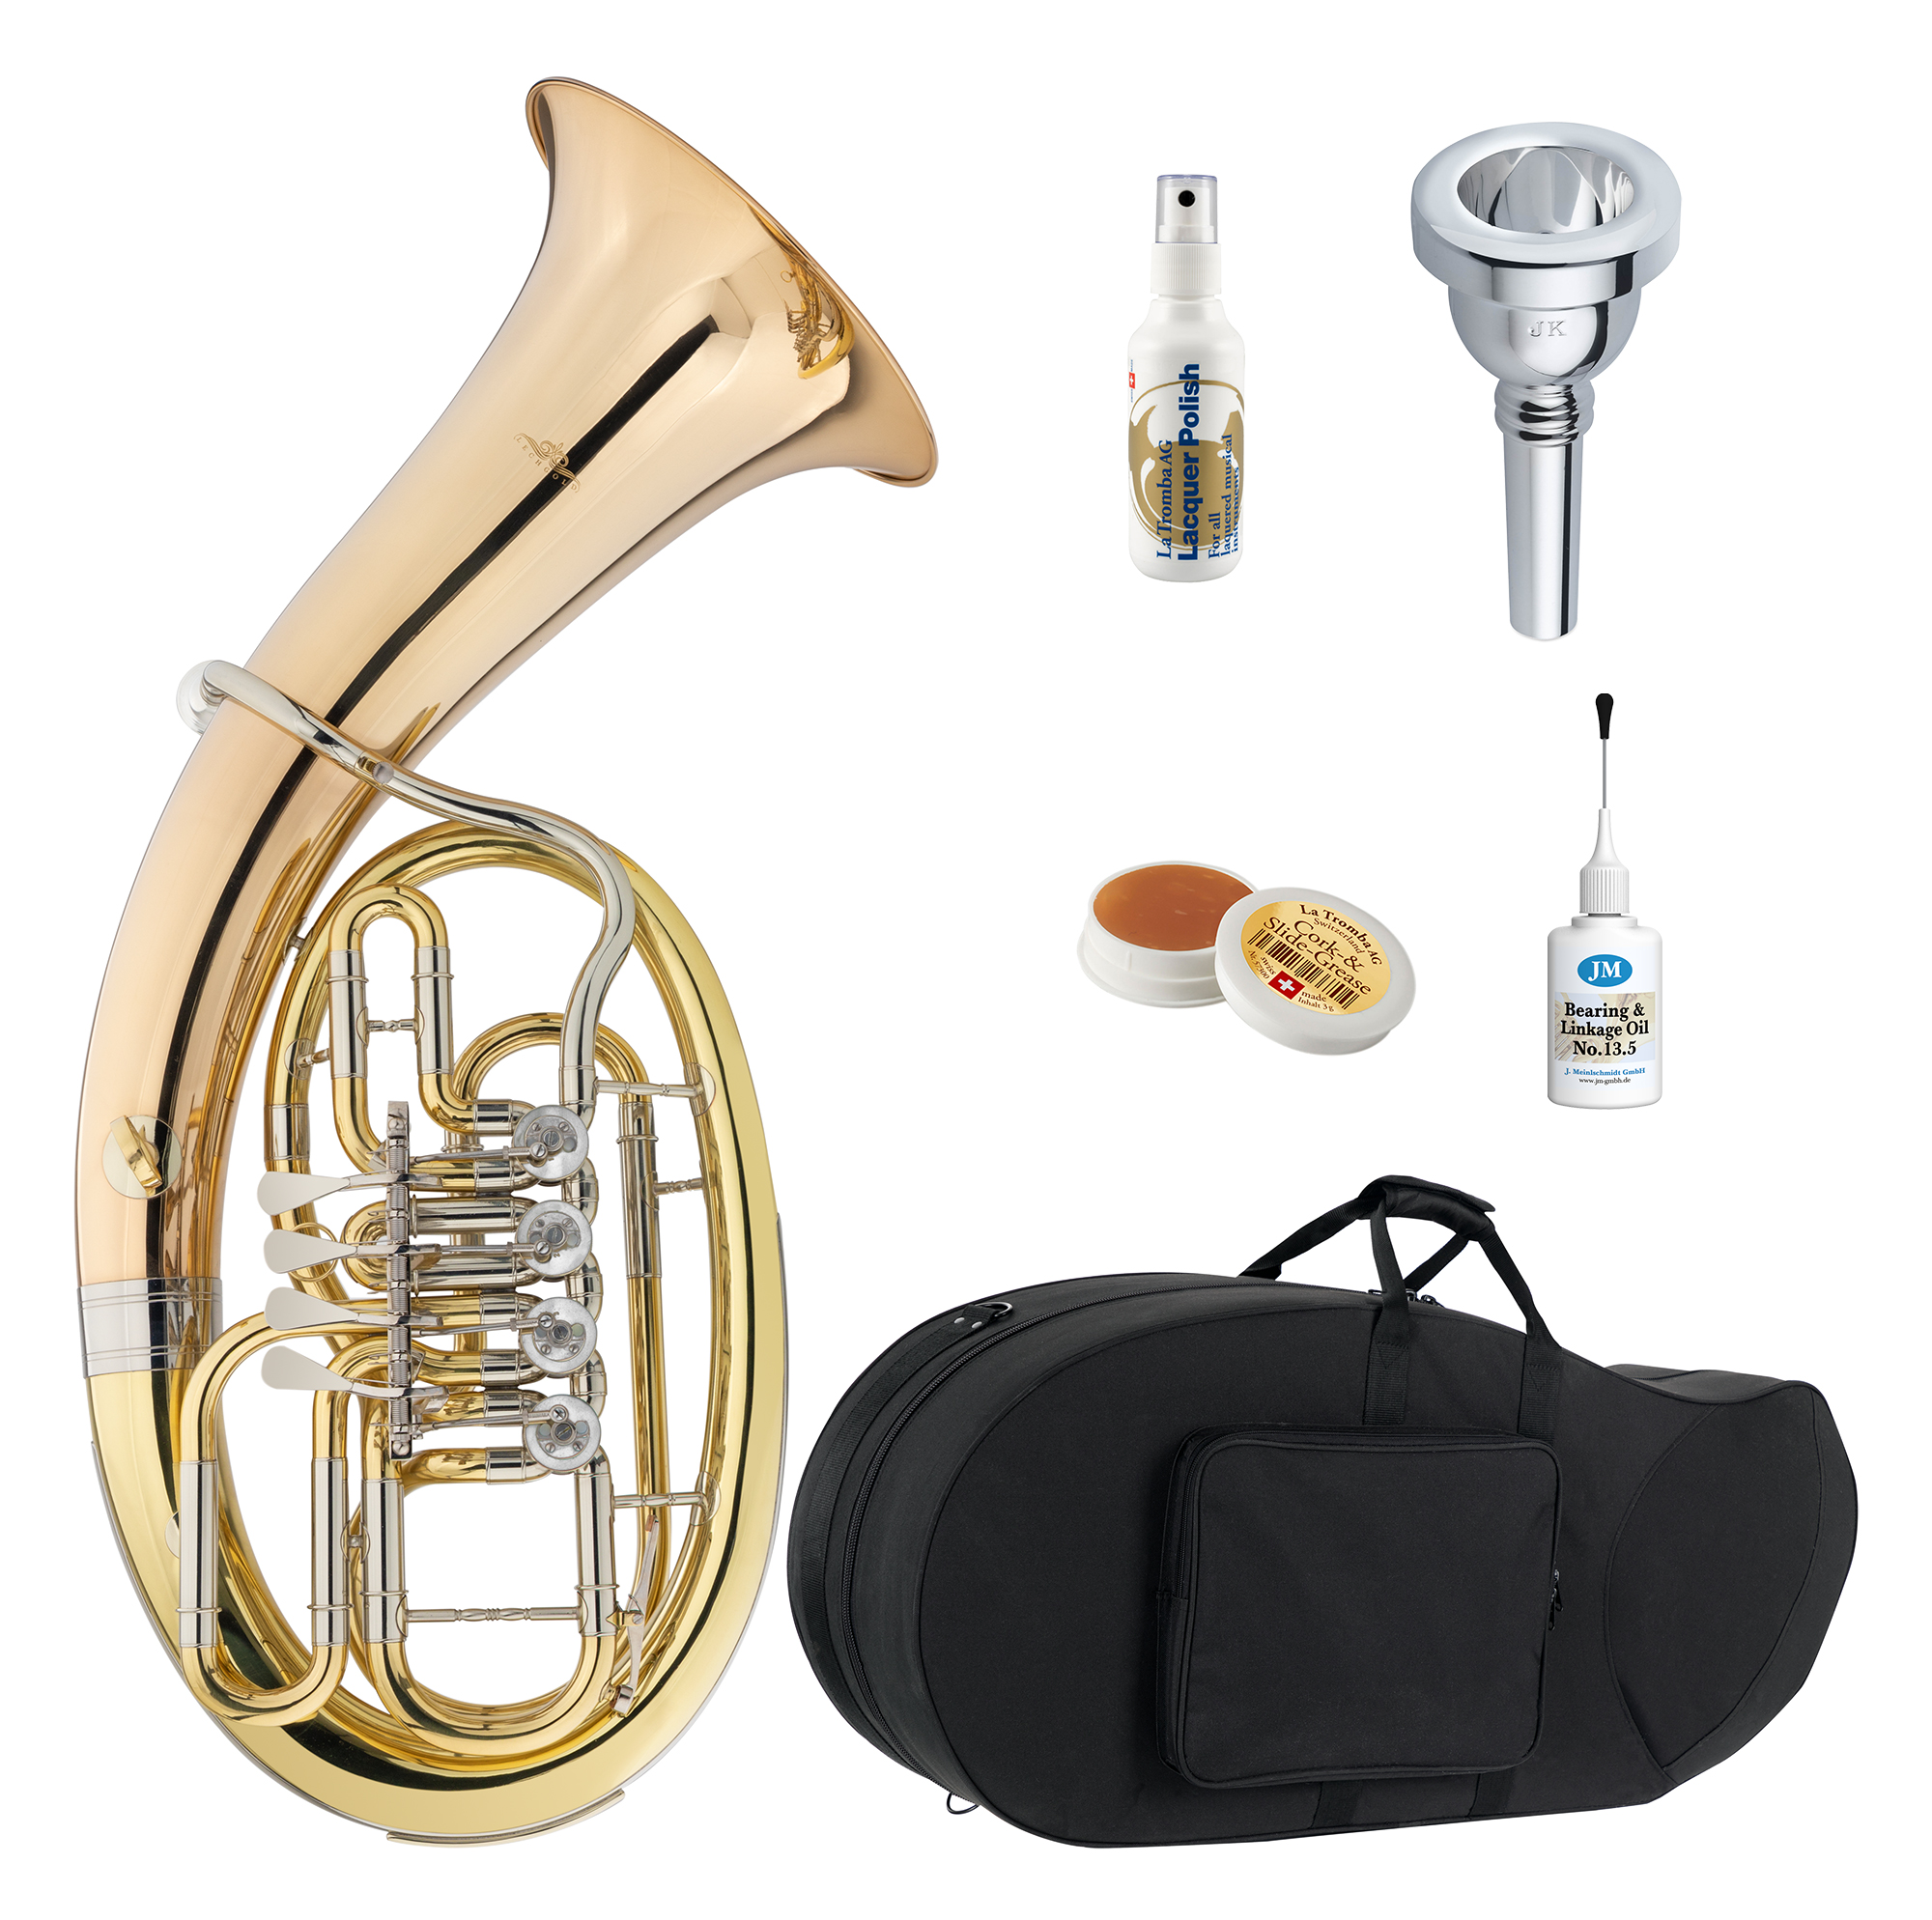 Baritone - Lechgold BH 19|4L Bariton Deluxe Set - Onlineshop Musikhaus Kirstein